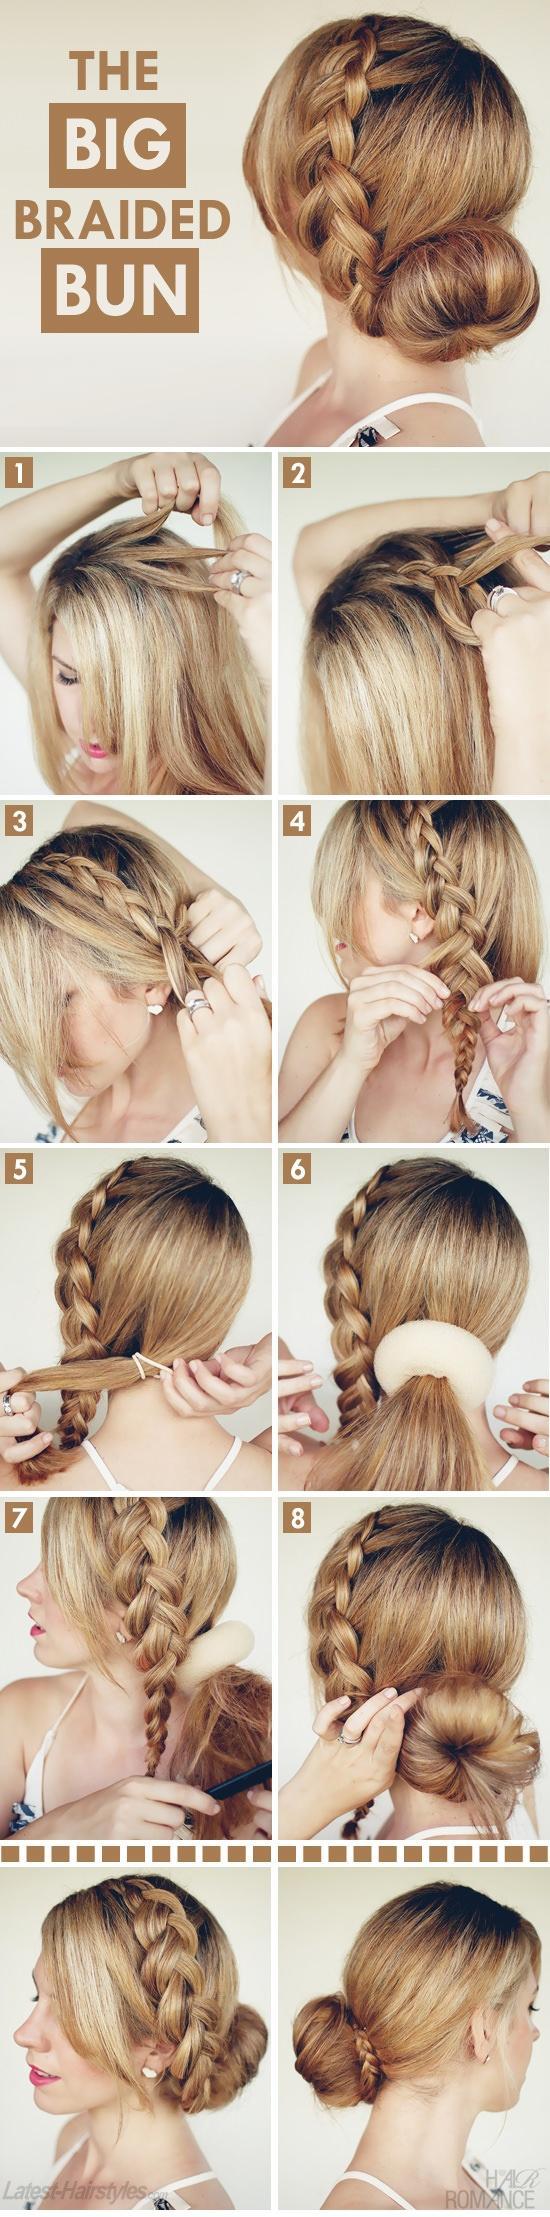 5 Minute Hair Tutorials For Holiday Season